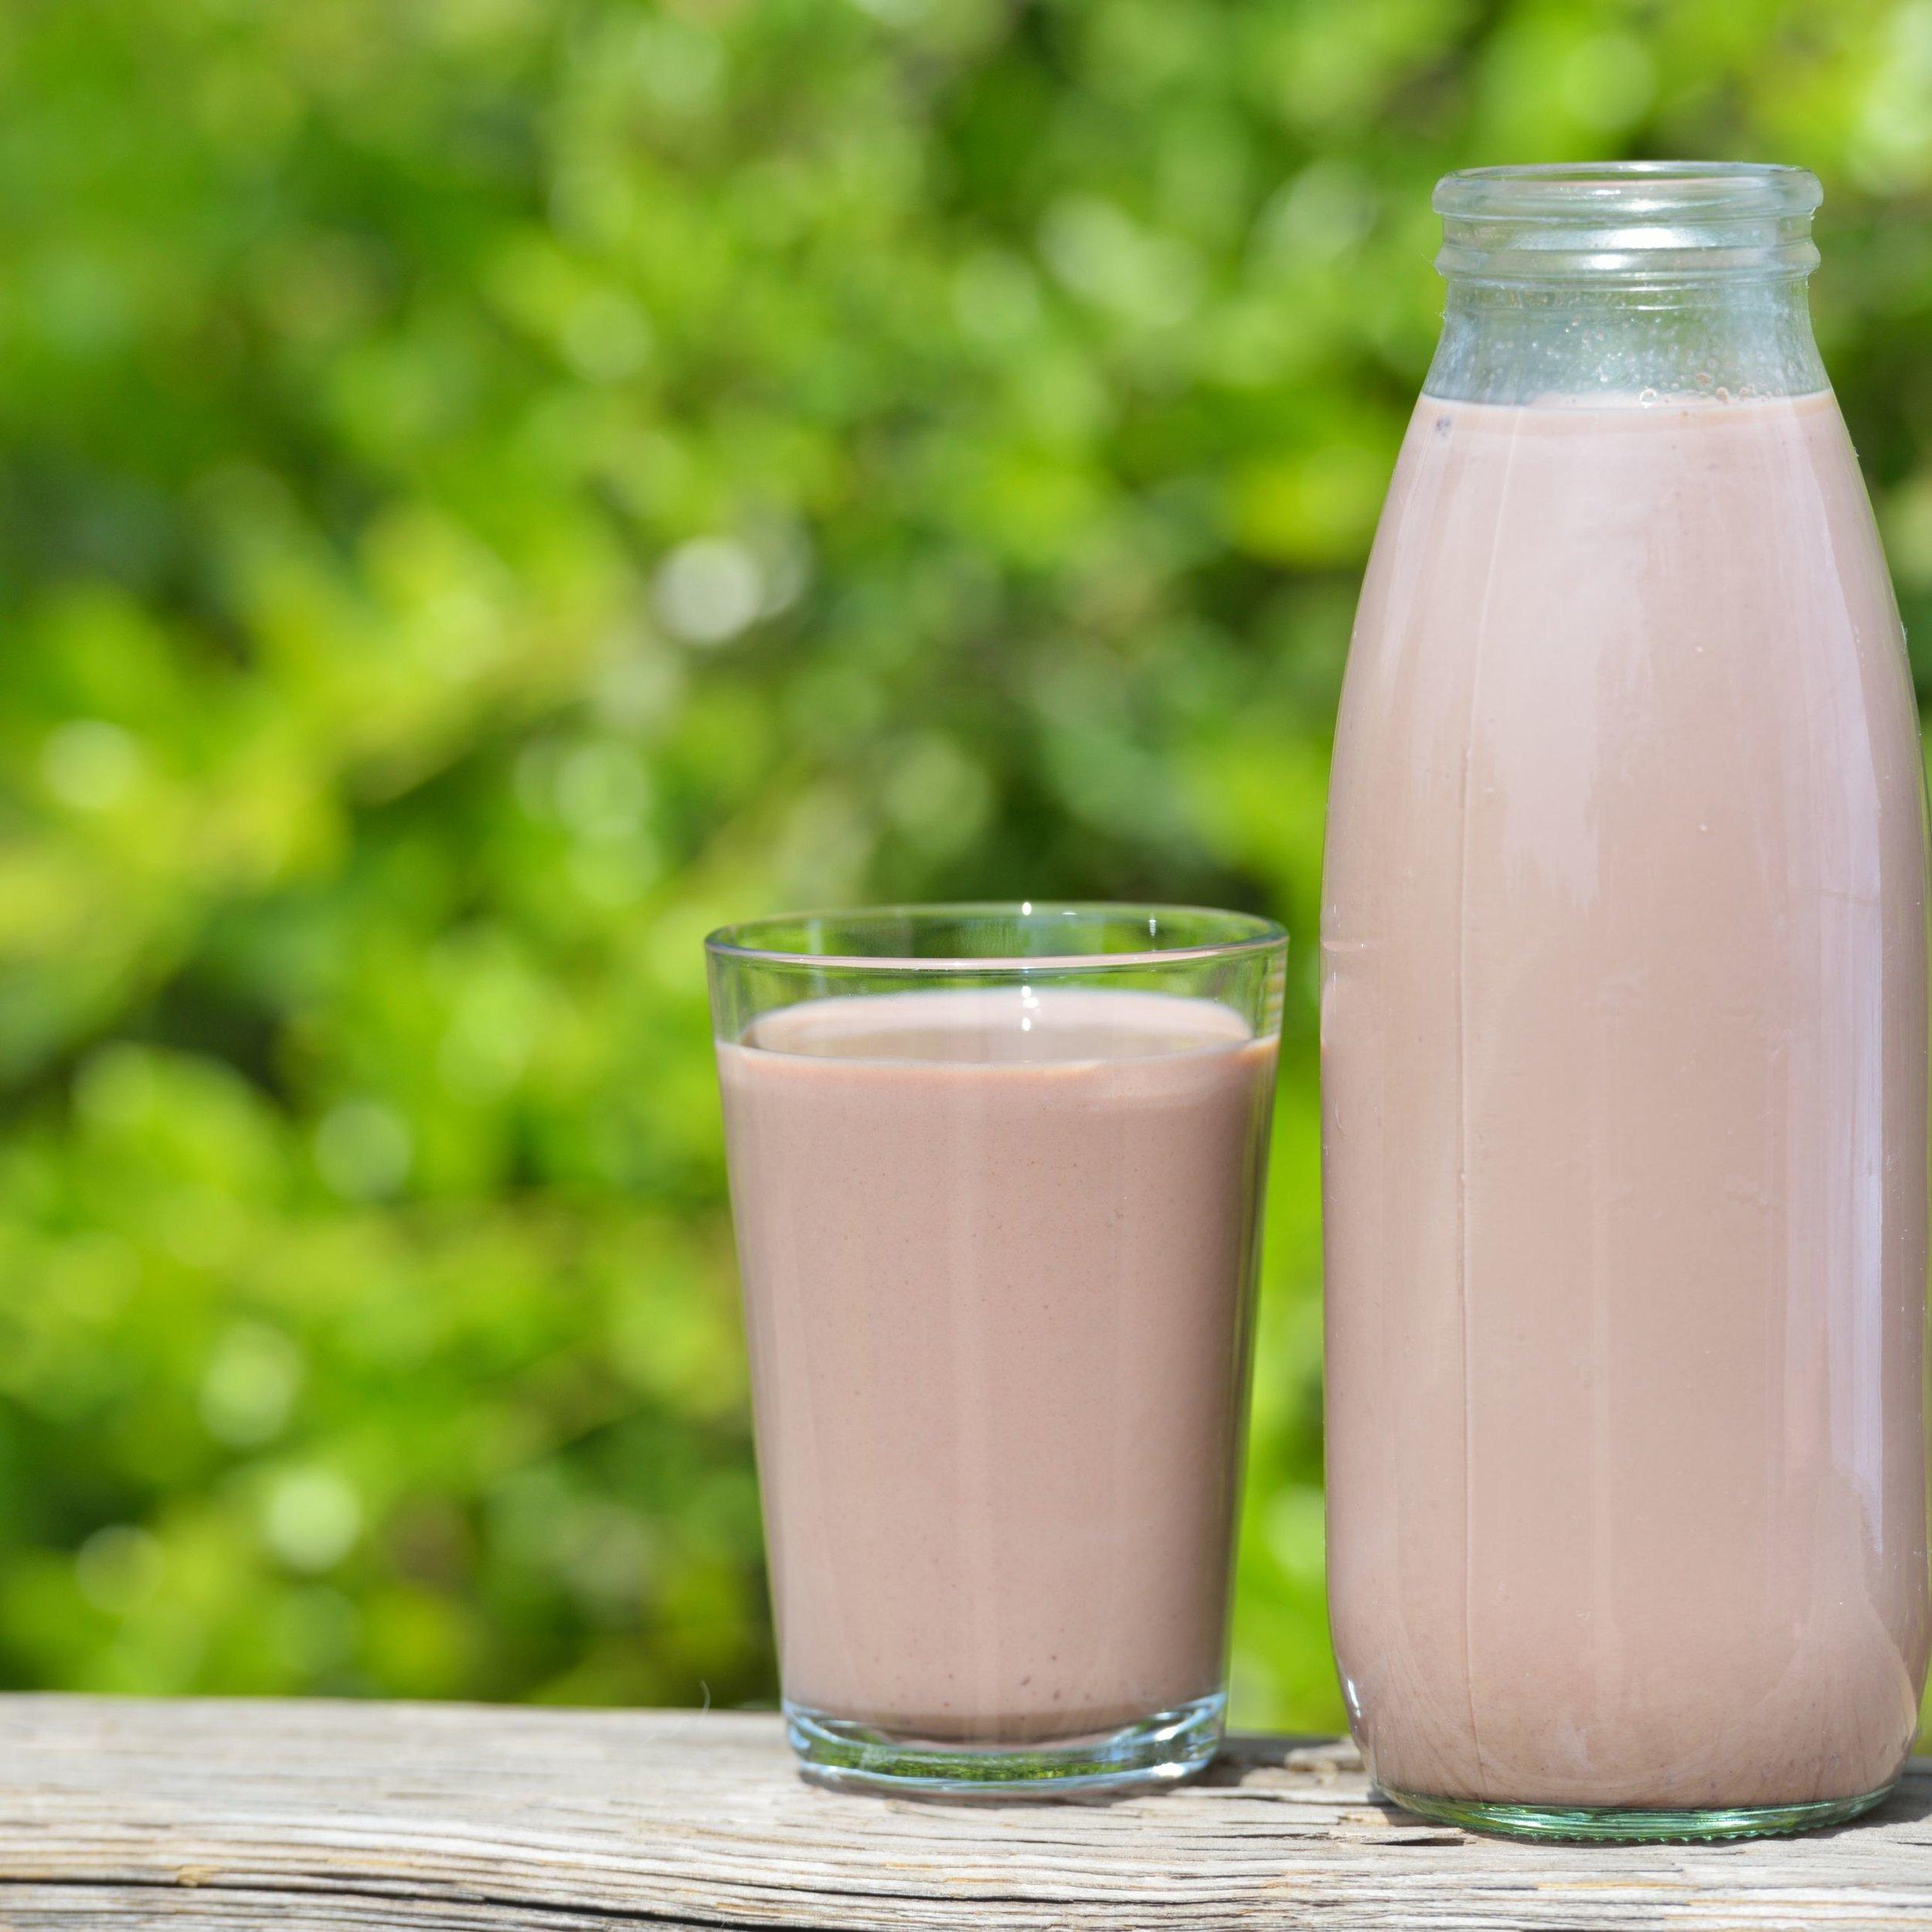 chocolate-milk-489225125-5ac400223418c600376611f0.jpg